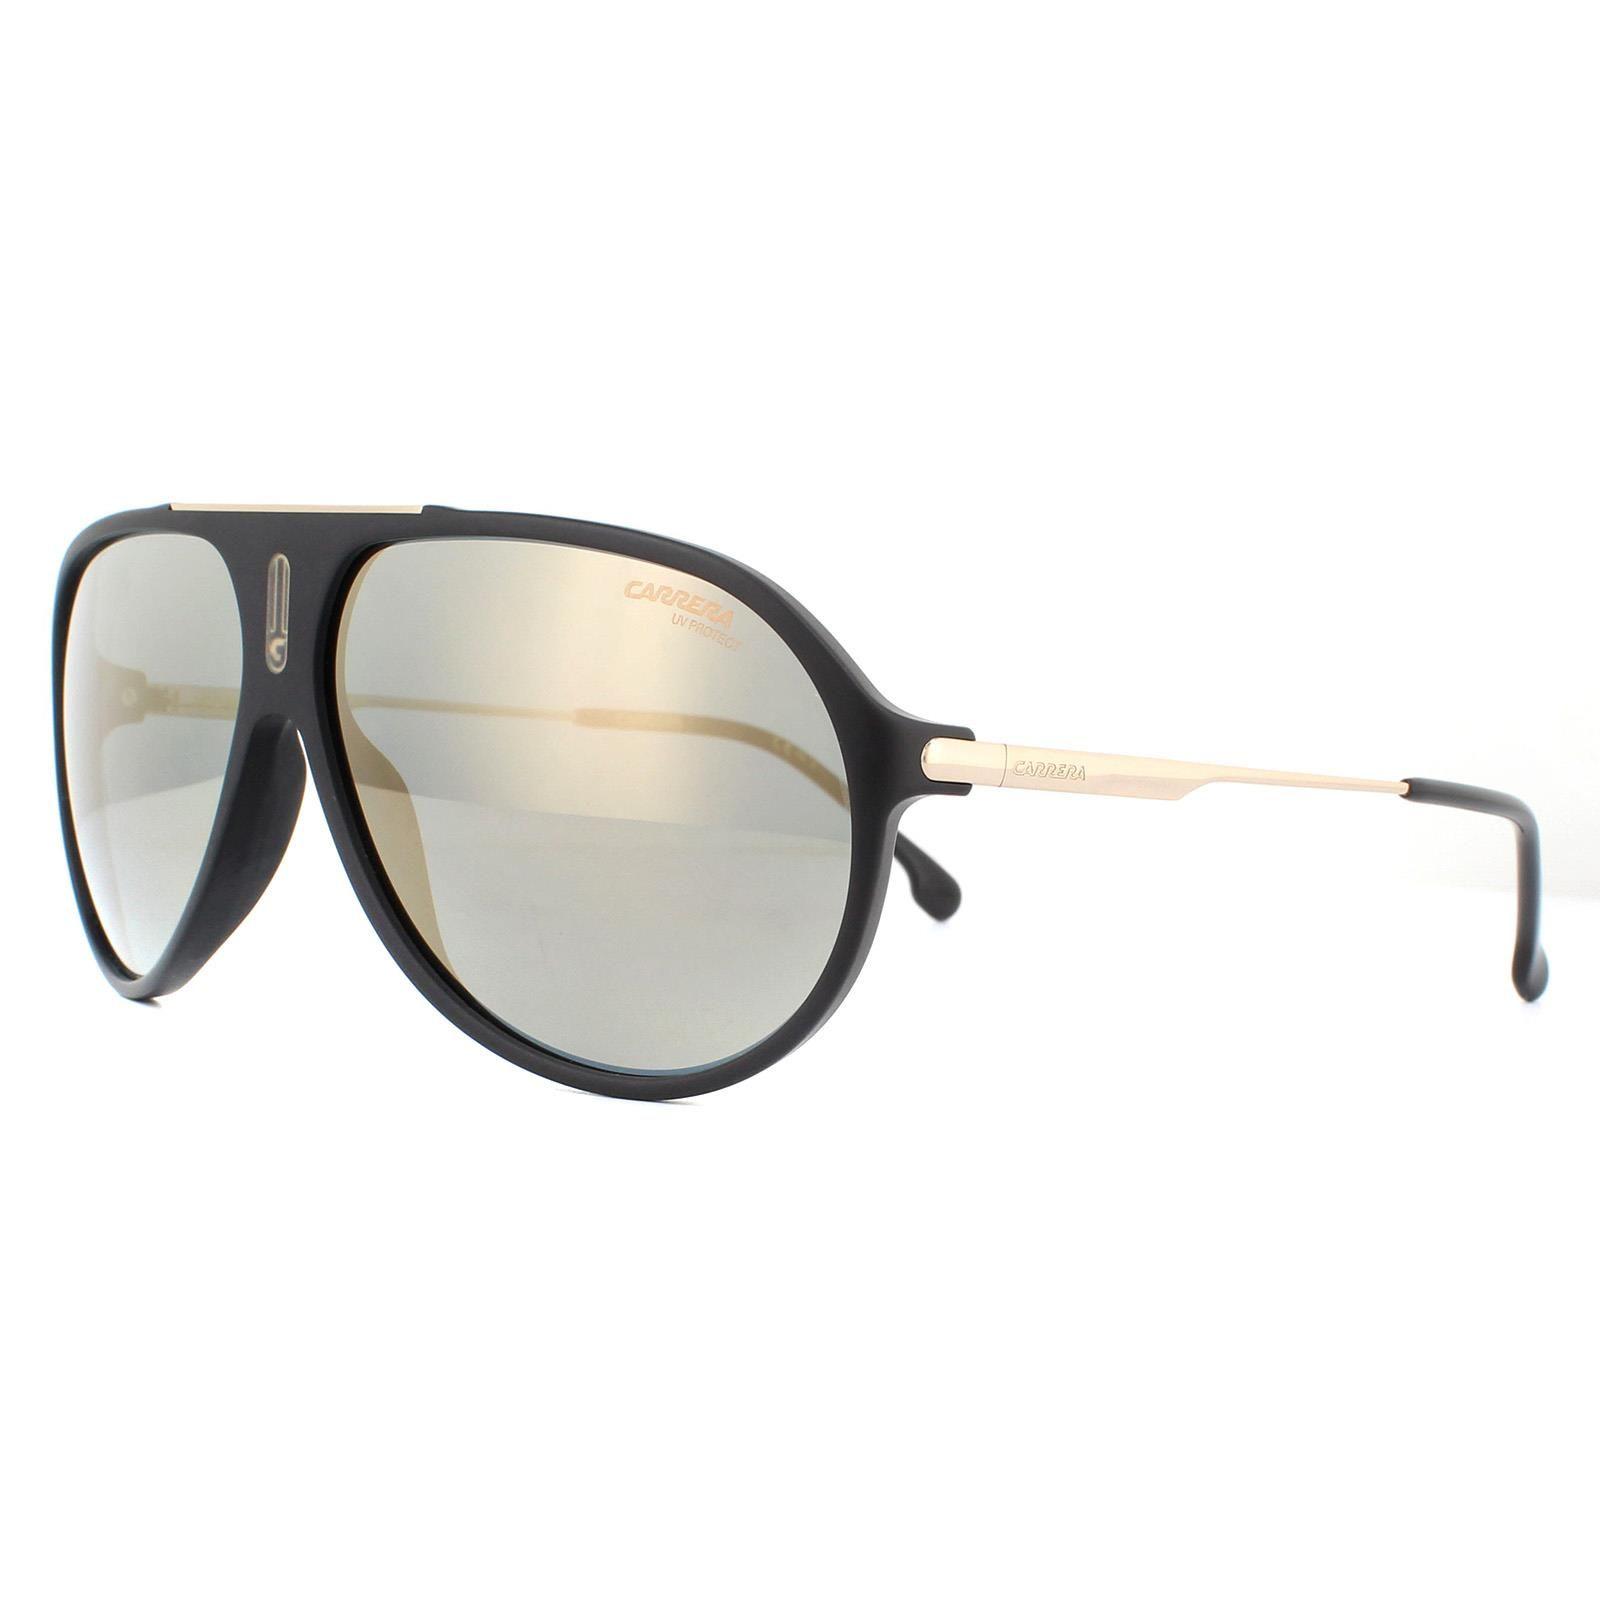 Carrera Sunglasses Hot 65 I46/JO Matte Black Gold Grey Bronze Mirrored